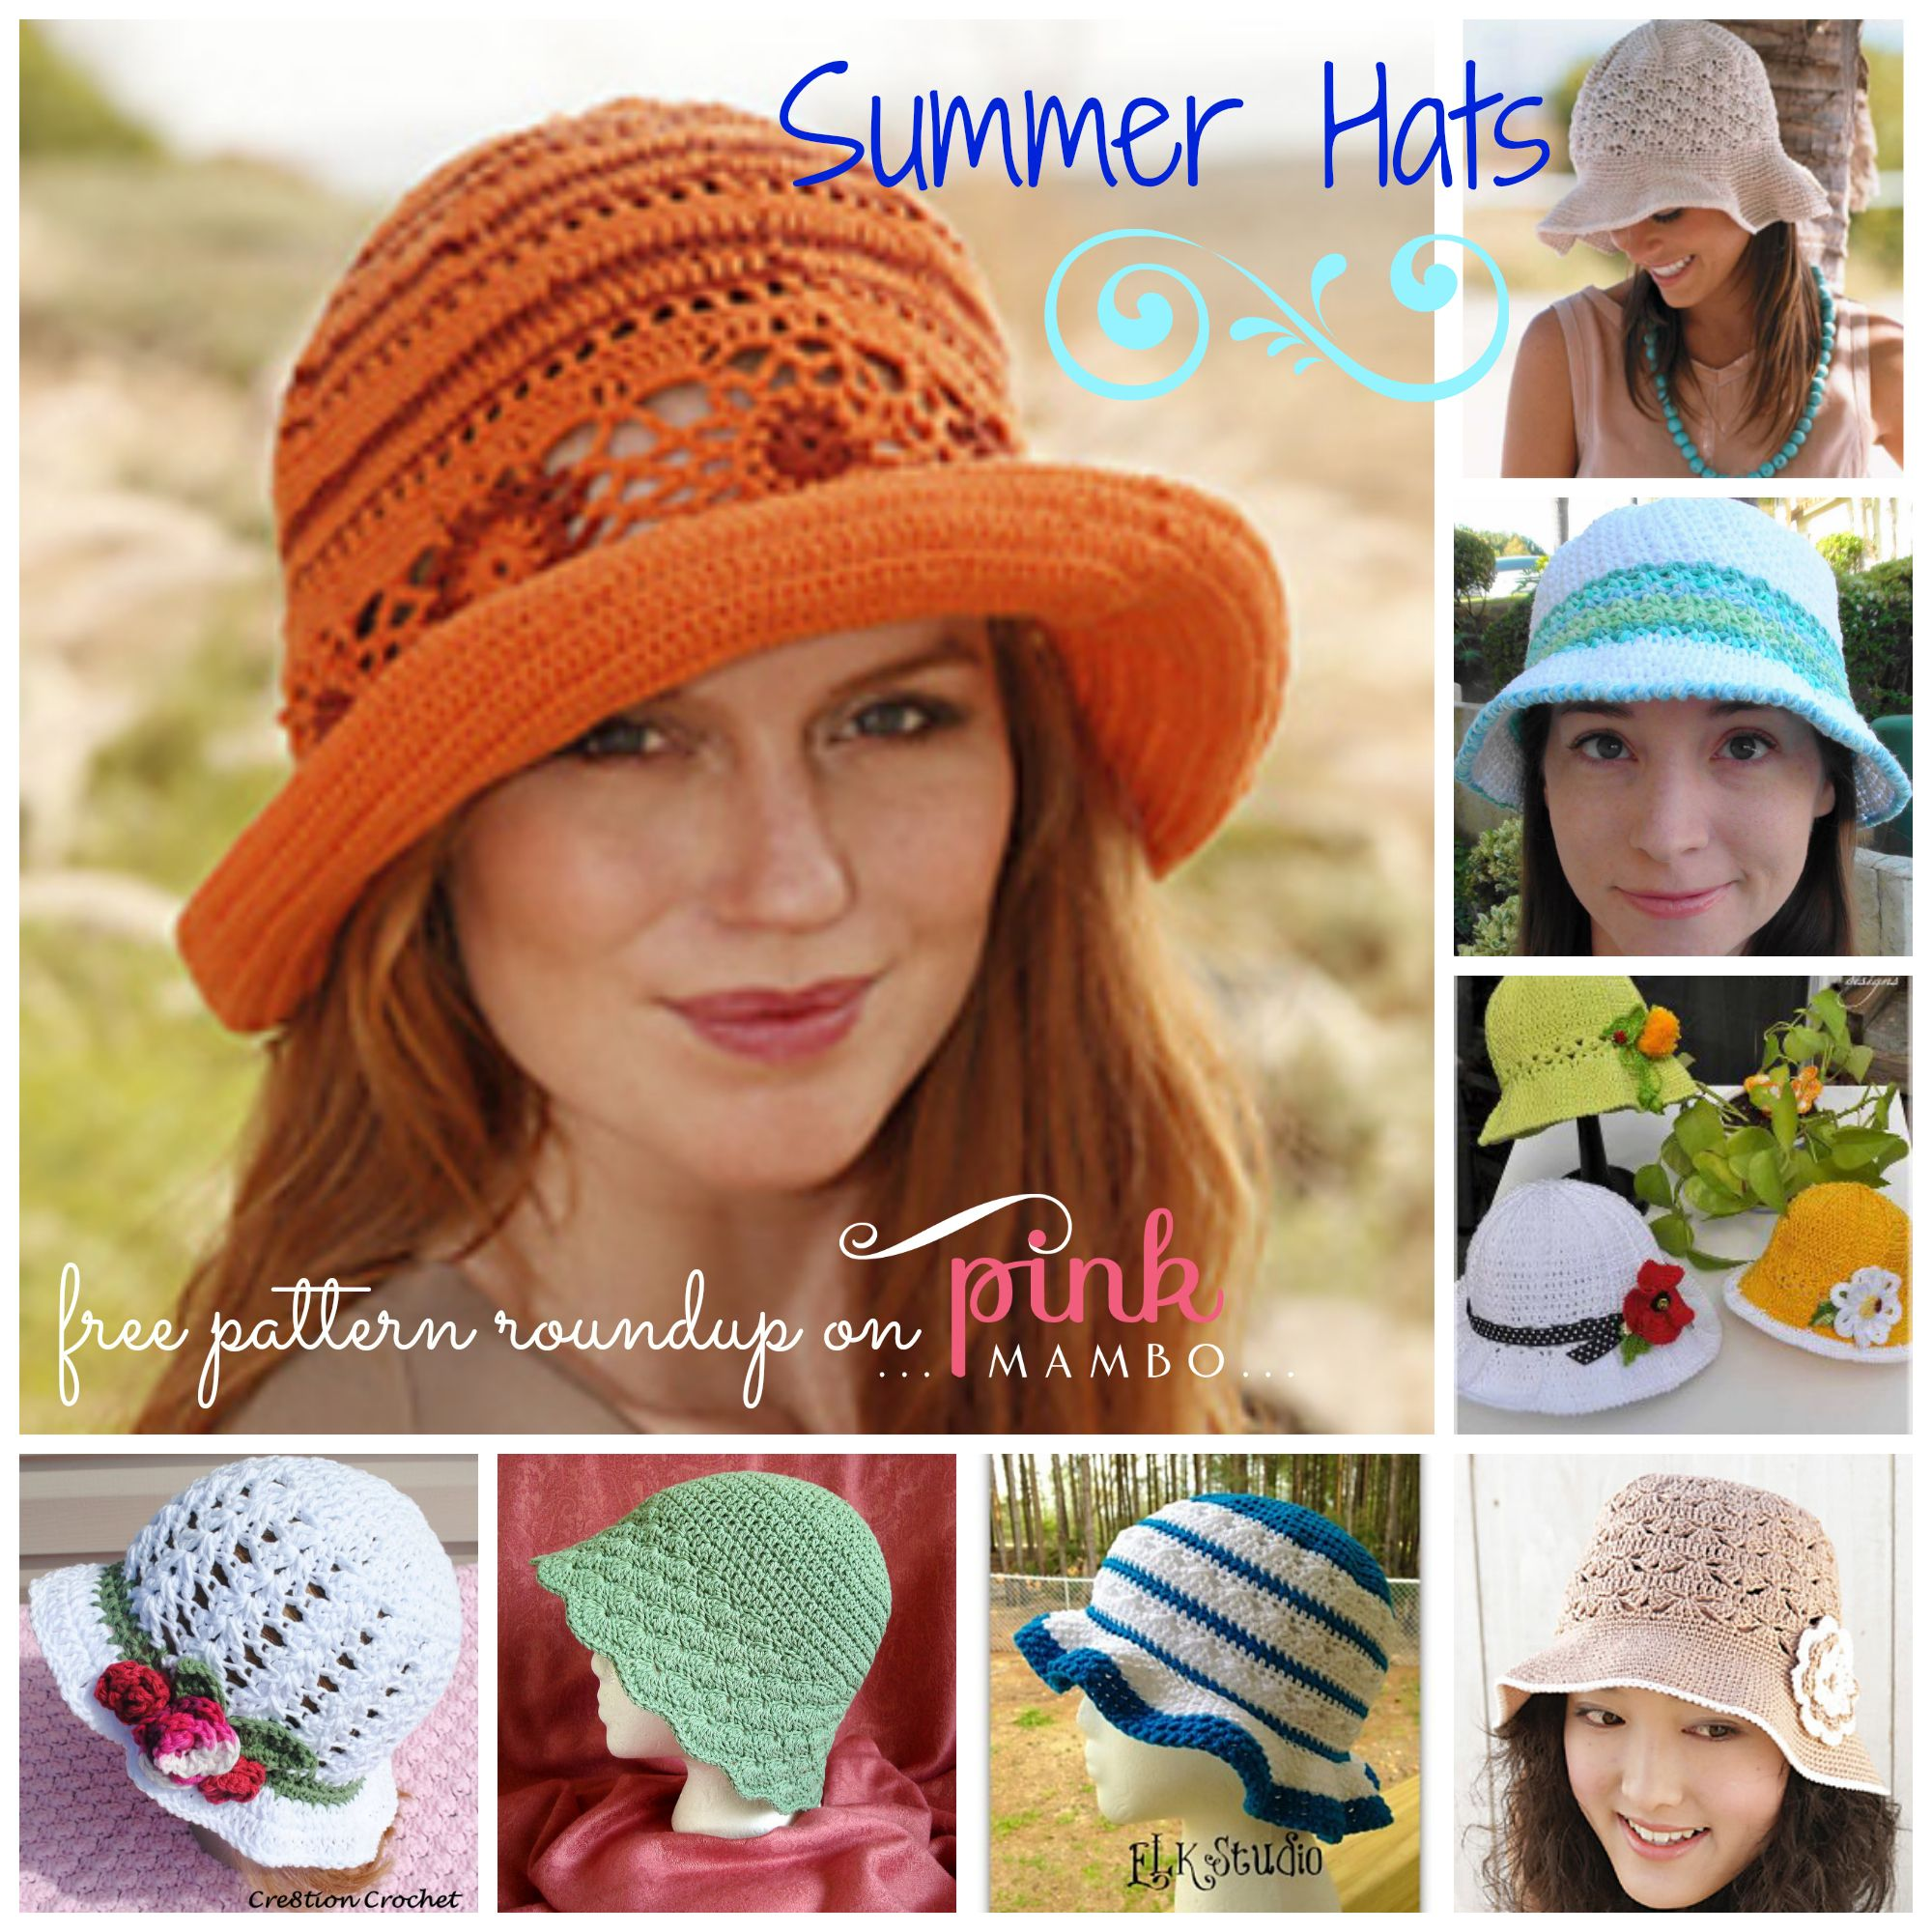 Crochet Summer Hats 8 Free Patterns! | Knitting and Crochet ...